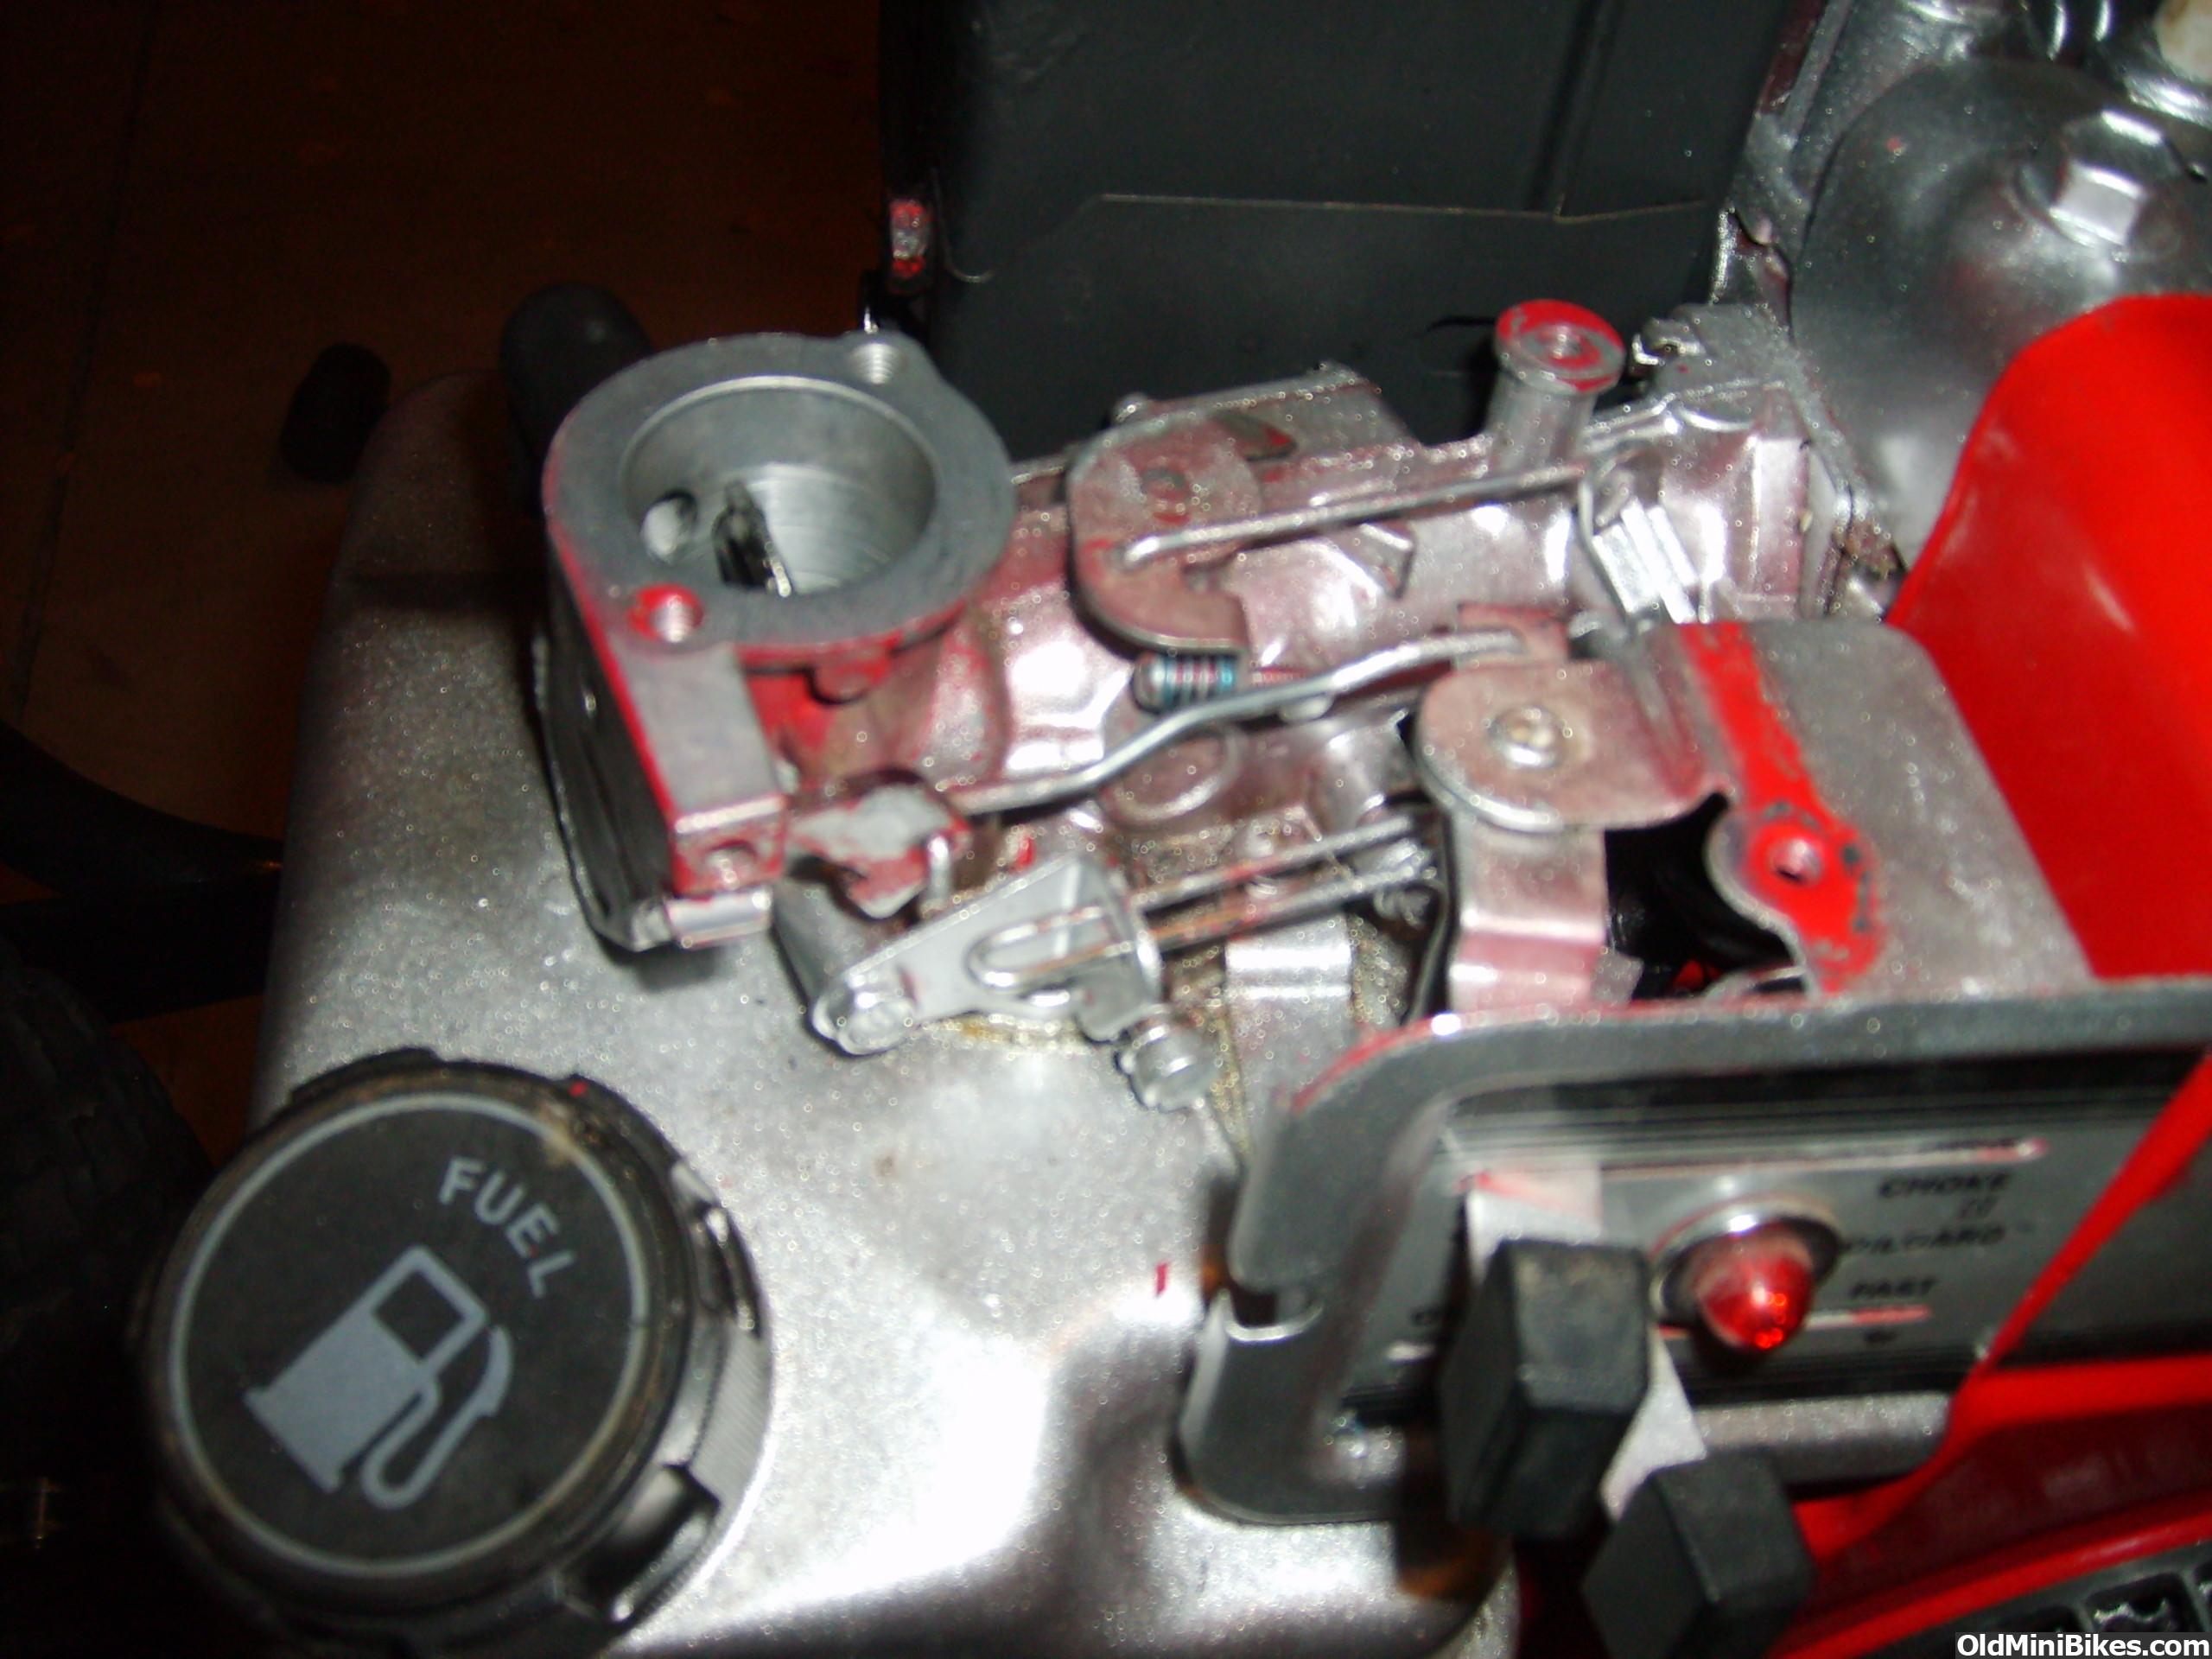 Bolens Tractor Wiring Diagram Opinions About 9 Hp Briggs Carburetor Schematic 3 5 Engine Stratton Elsalvadorla Lawn Mower